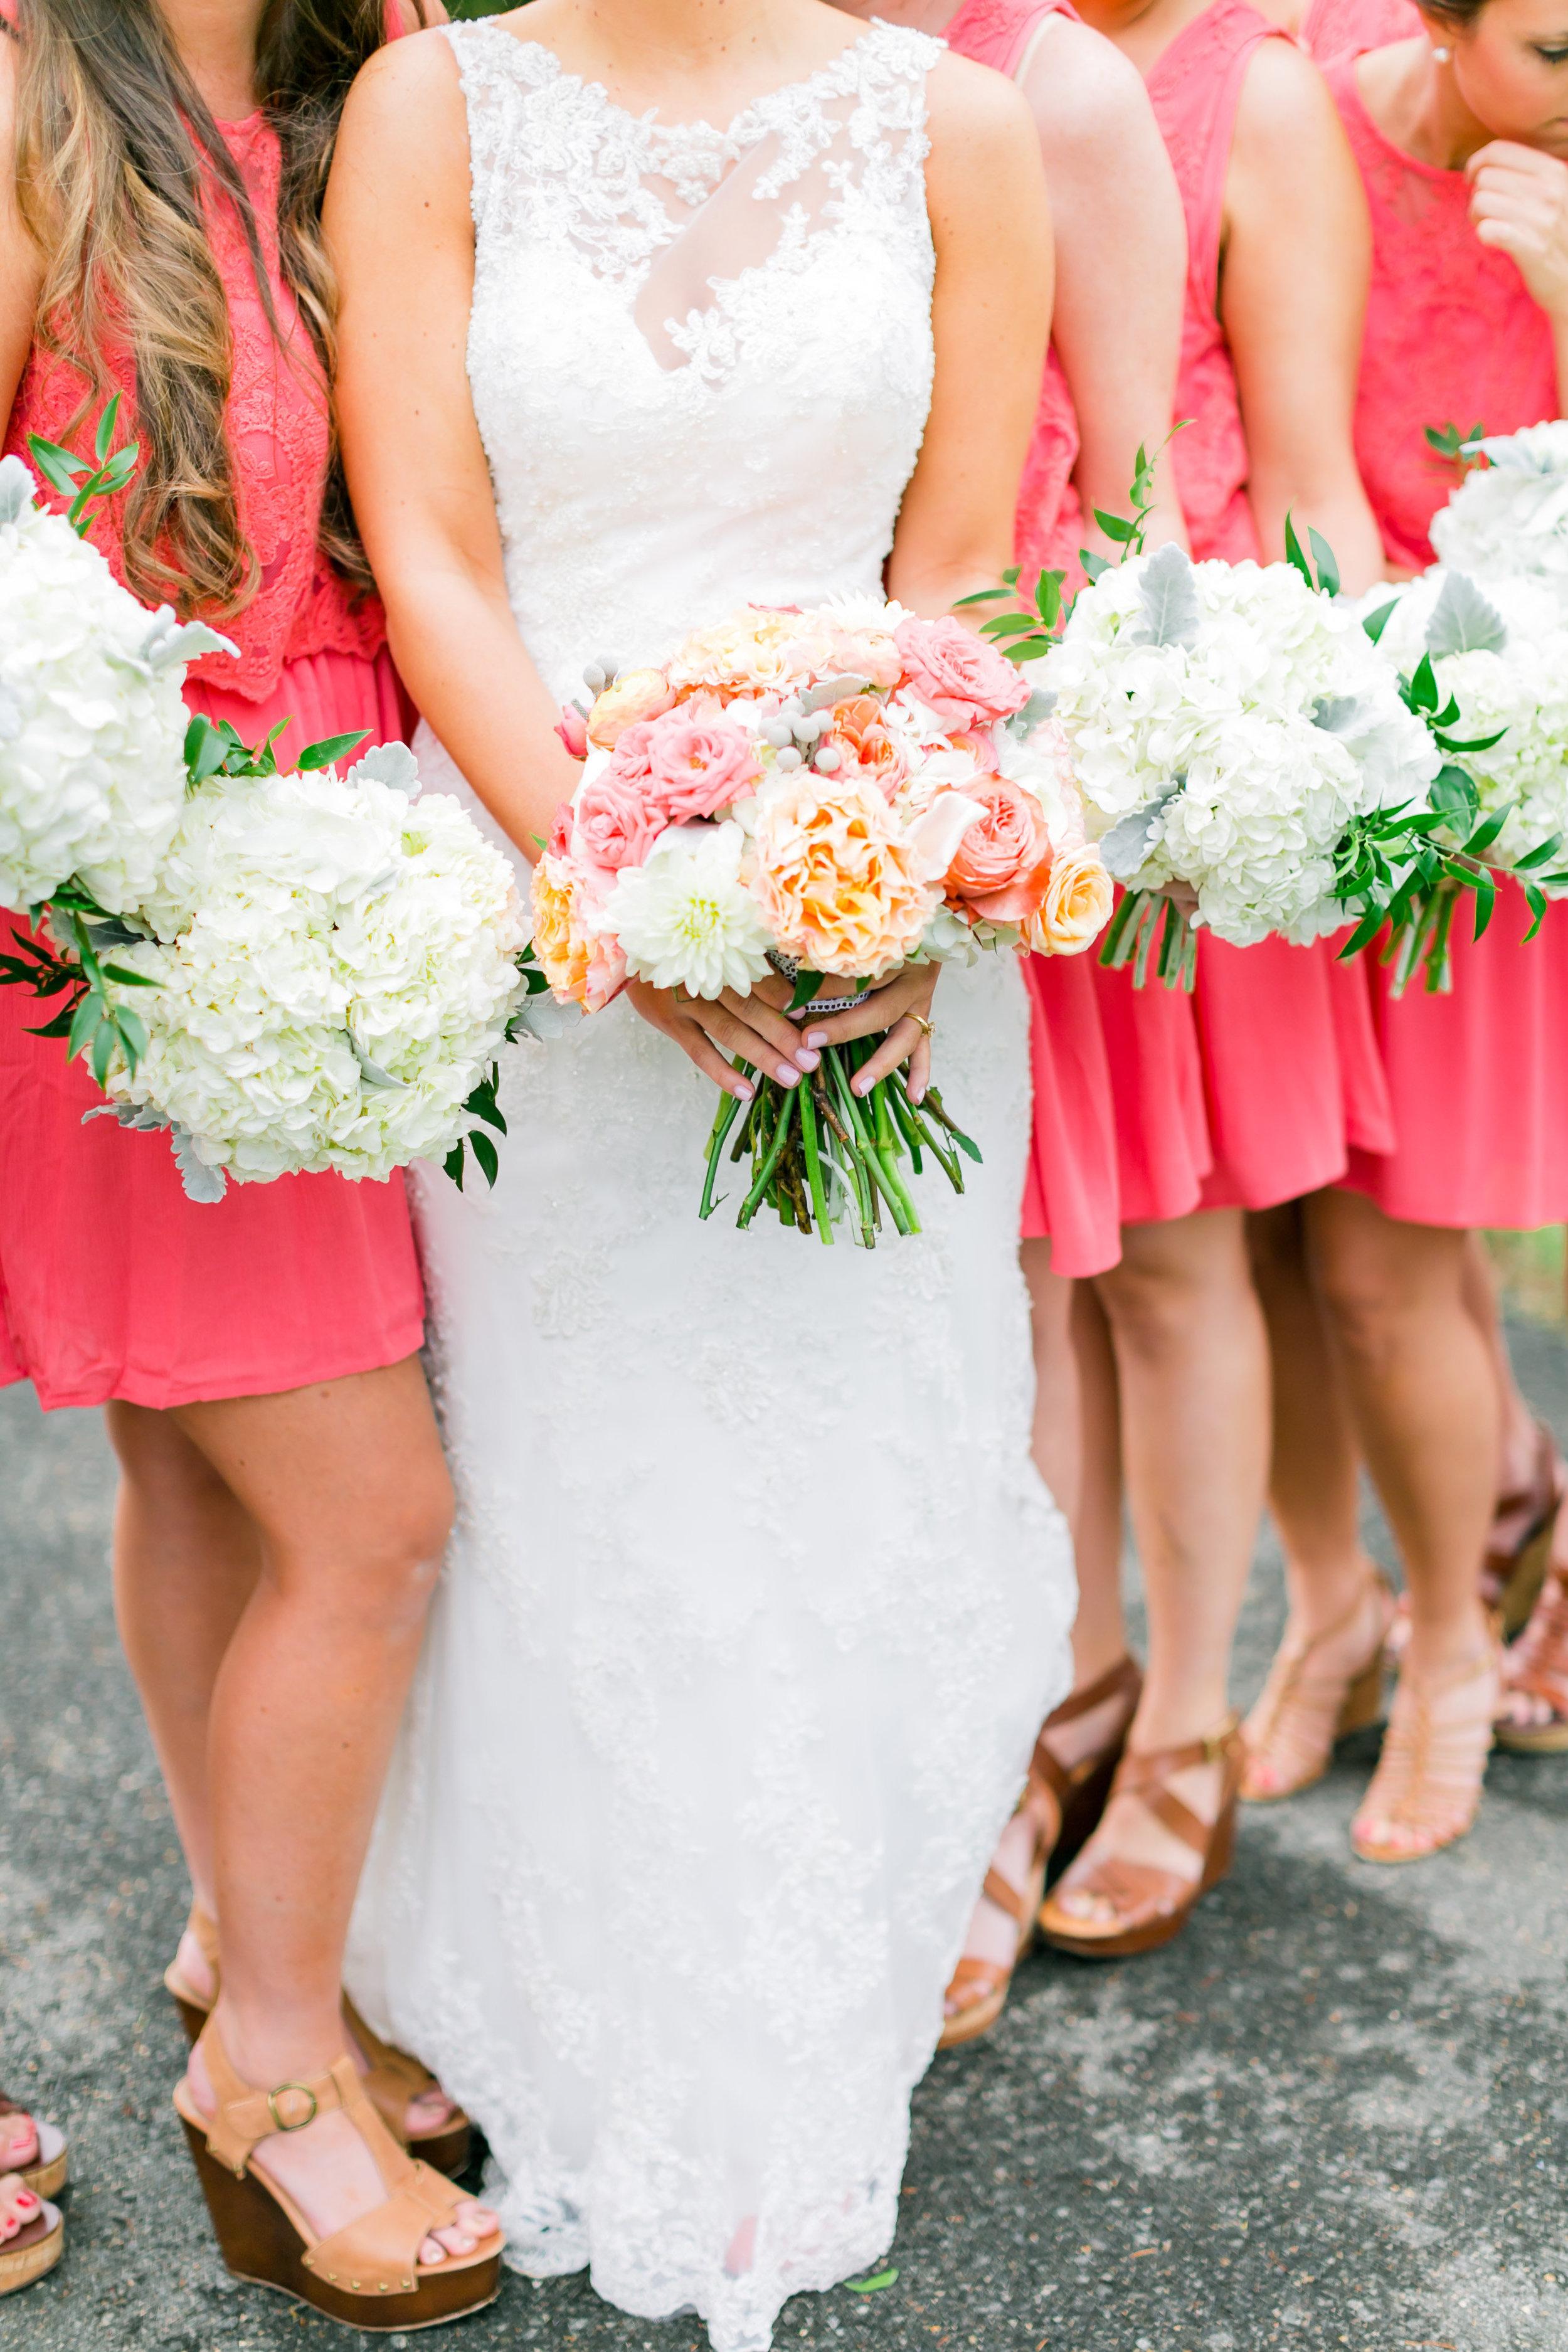 Stone Tower Winery Wedding Photos Virginia Wedding Photographer Megan Kelsey-11.jpg